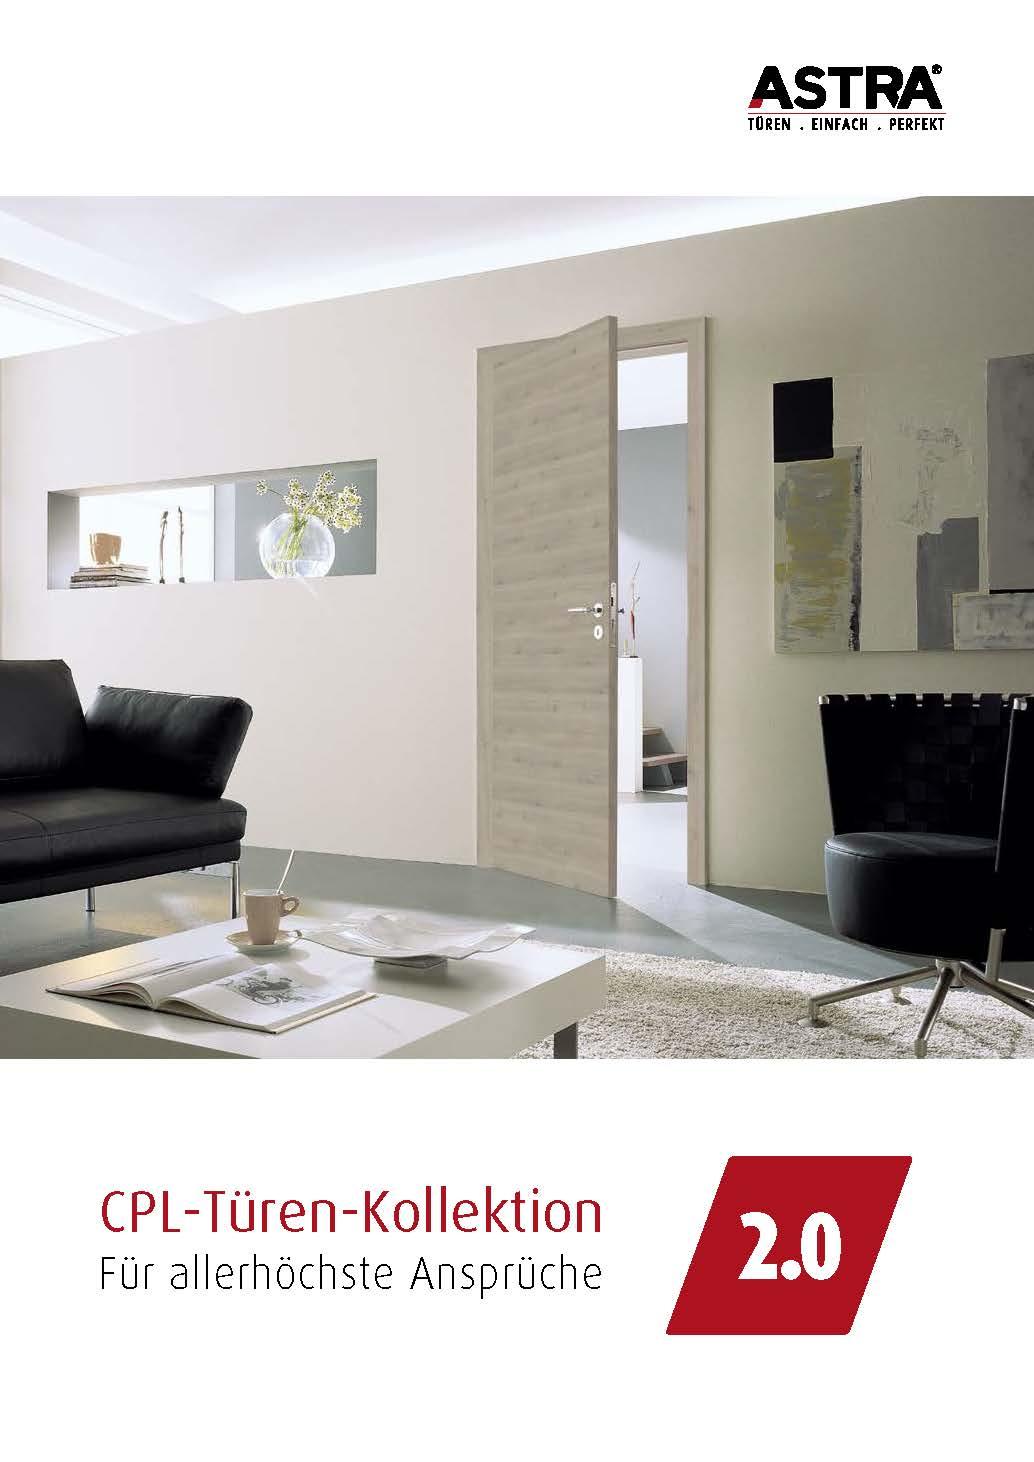 holzkellner parkett laminat t ren terrasse zaun f r plauen treuen adorf auerbach. Black Bedroom Furniture Sets. Home Design Ideas